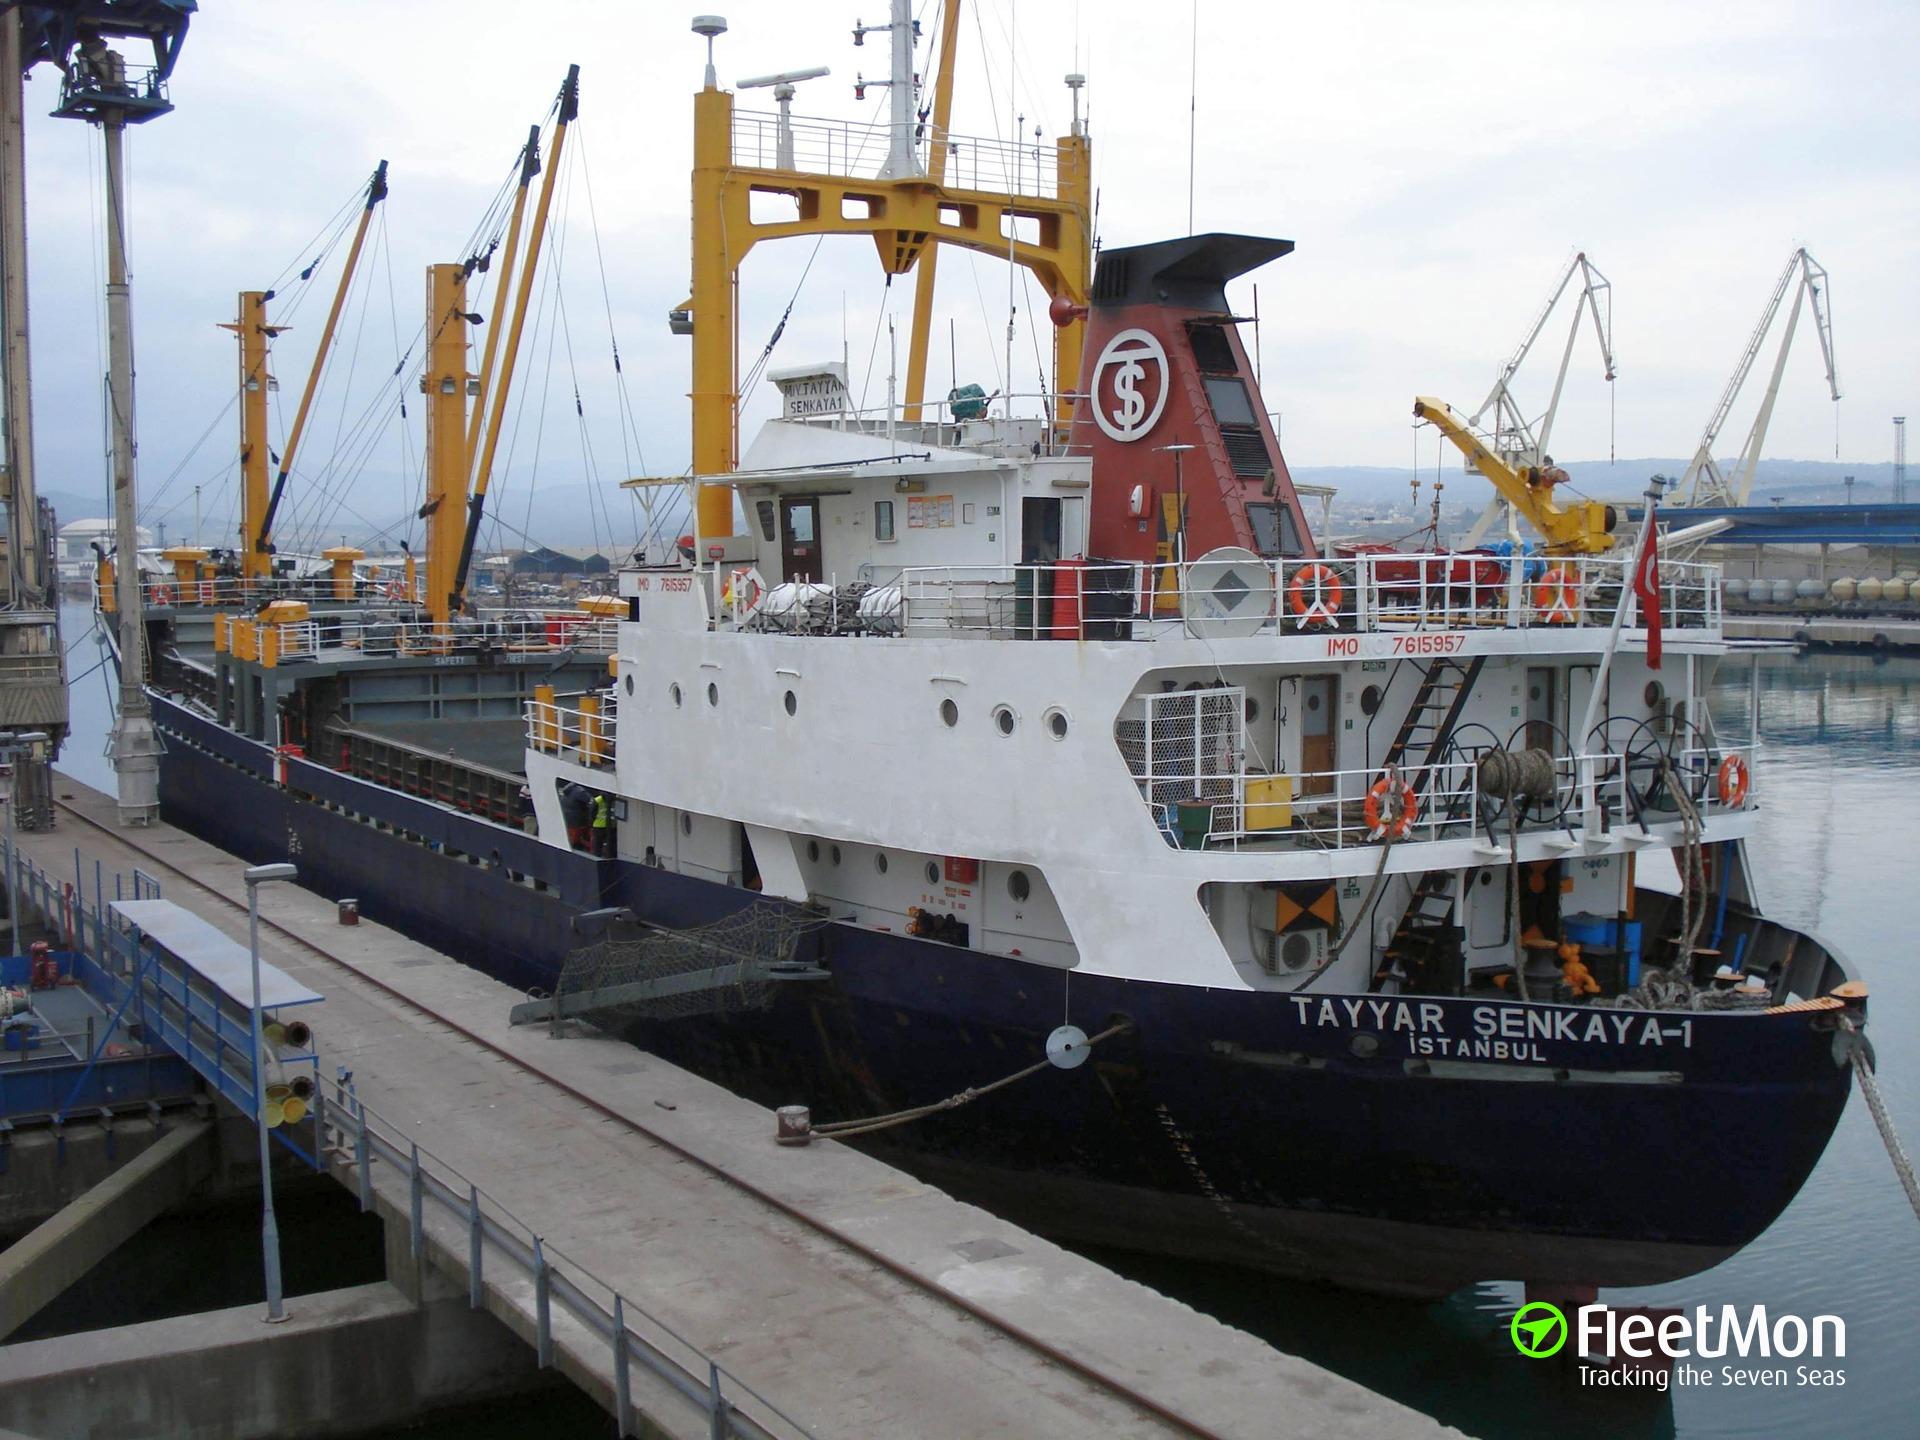 Turkish freighter Tayyar Senkaya 1 sank in Mediterranean sea